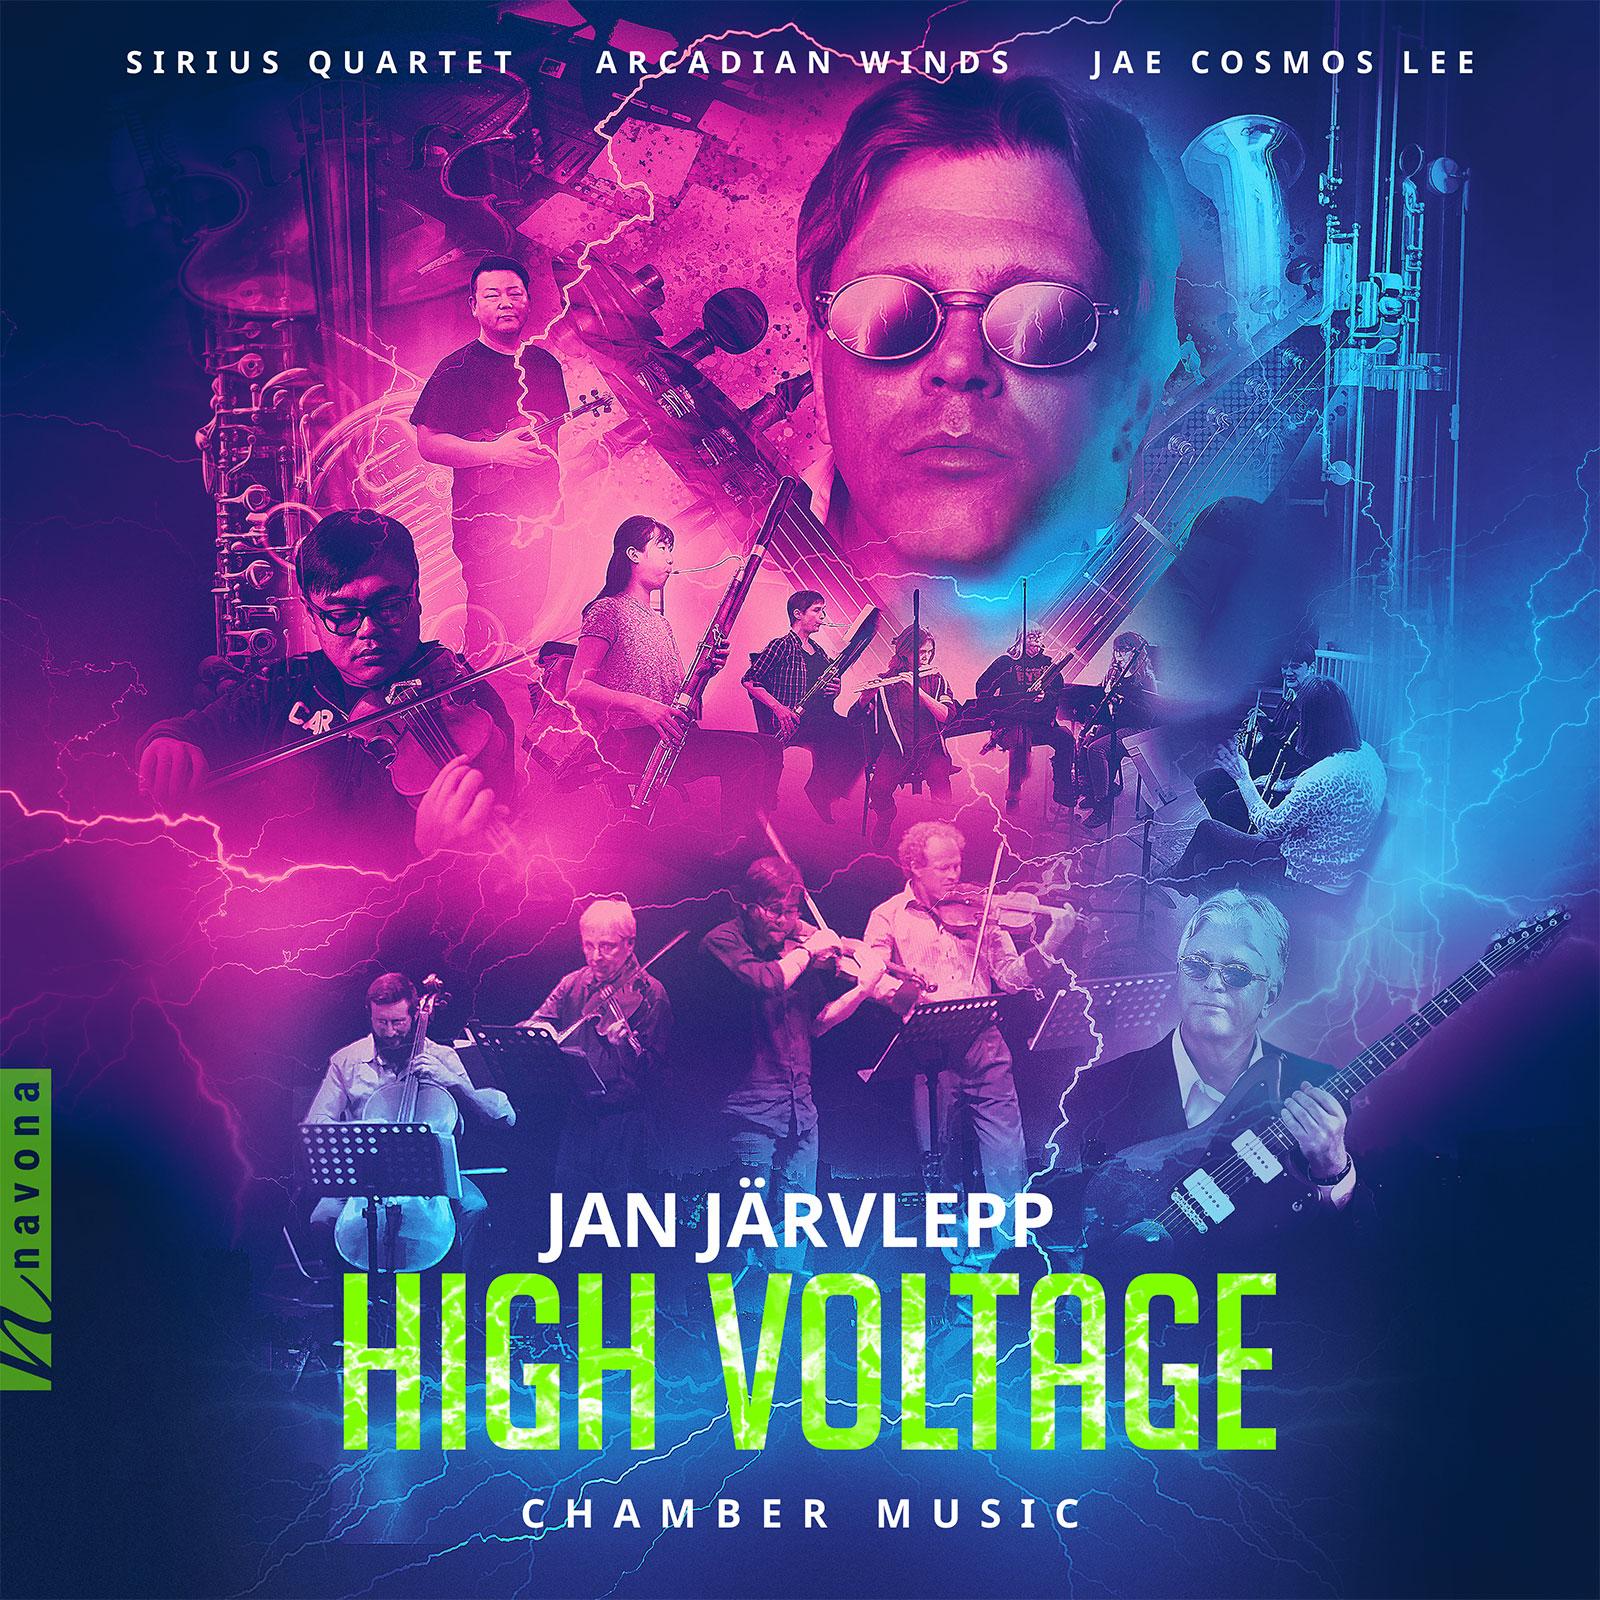 High Voltage - Jan Jarvlepp - Album Cover